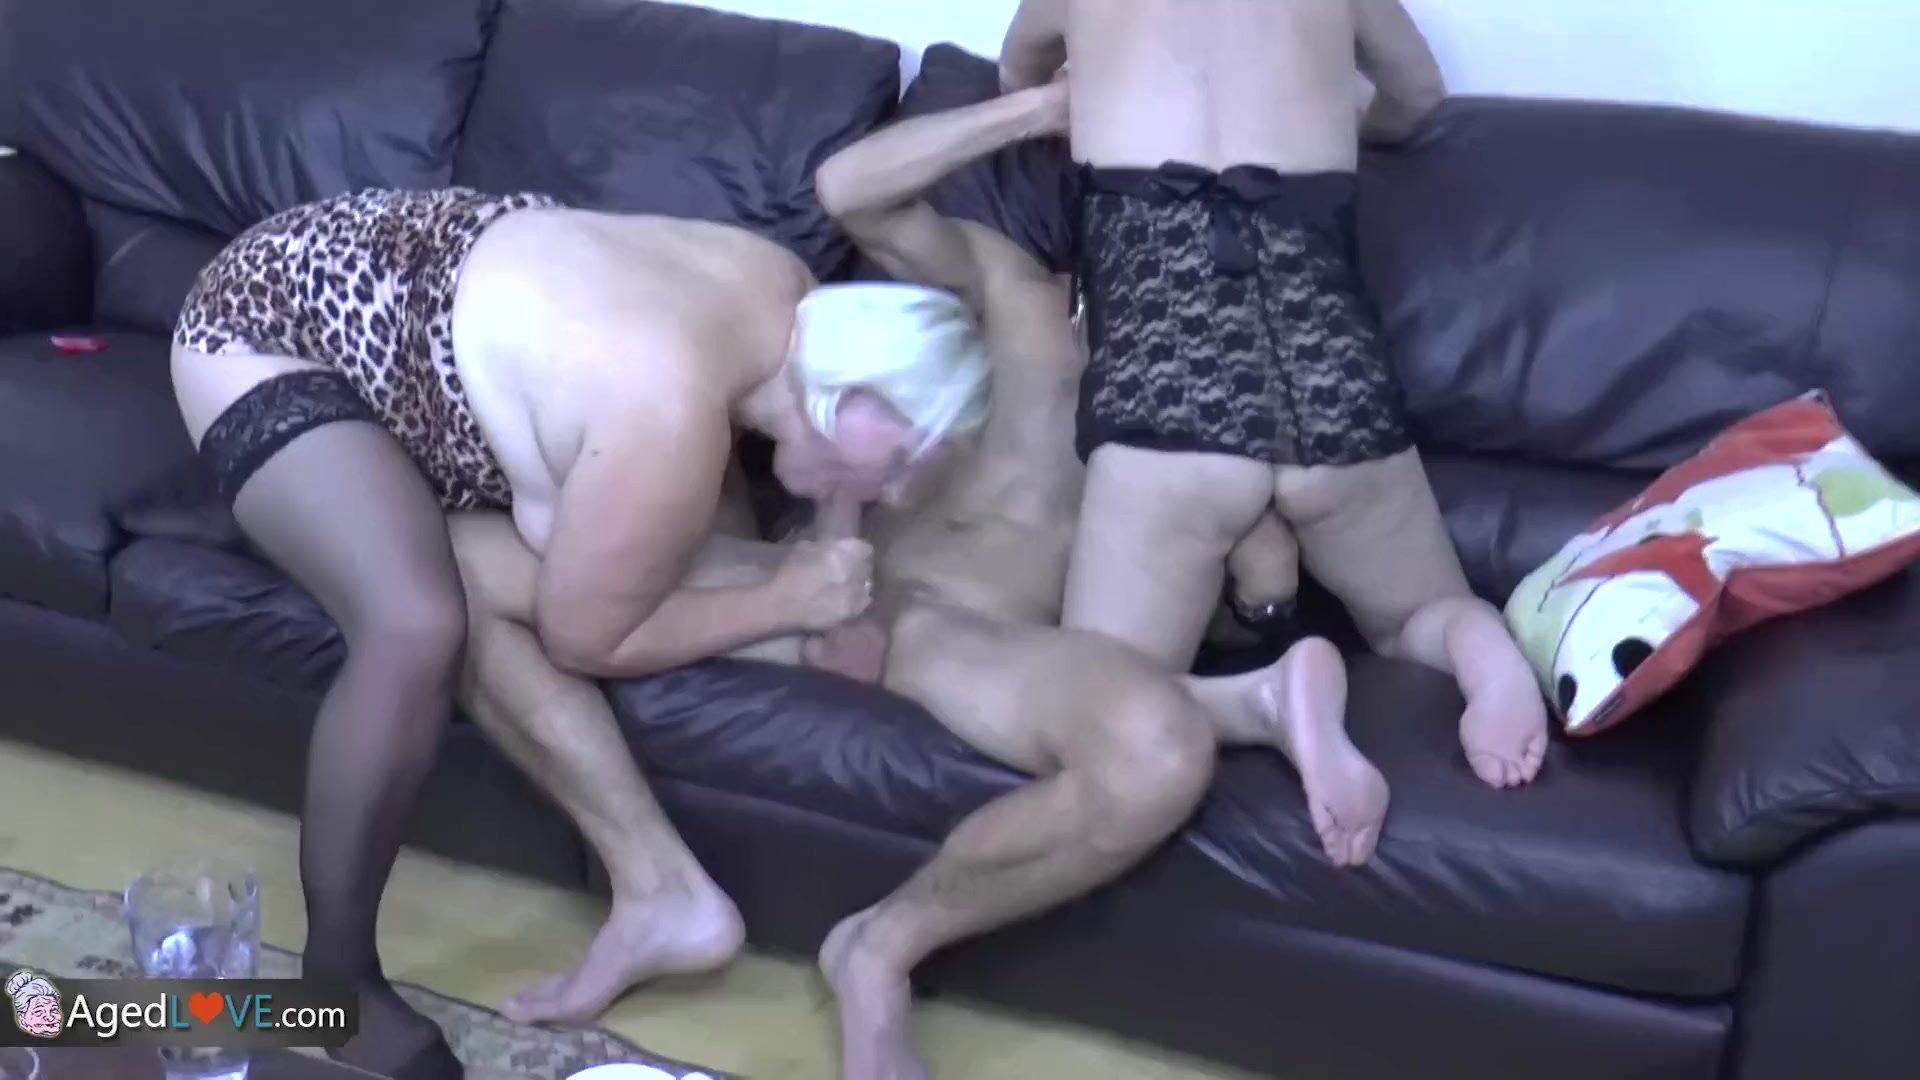 Mature/mom/lacey chubby hardcore mature fun